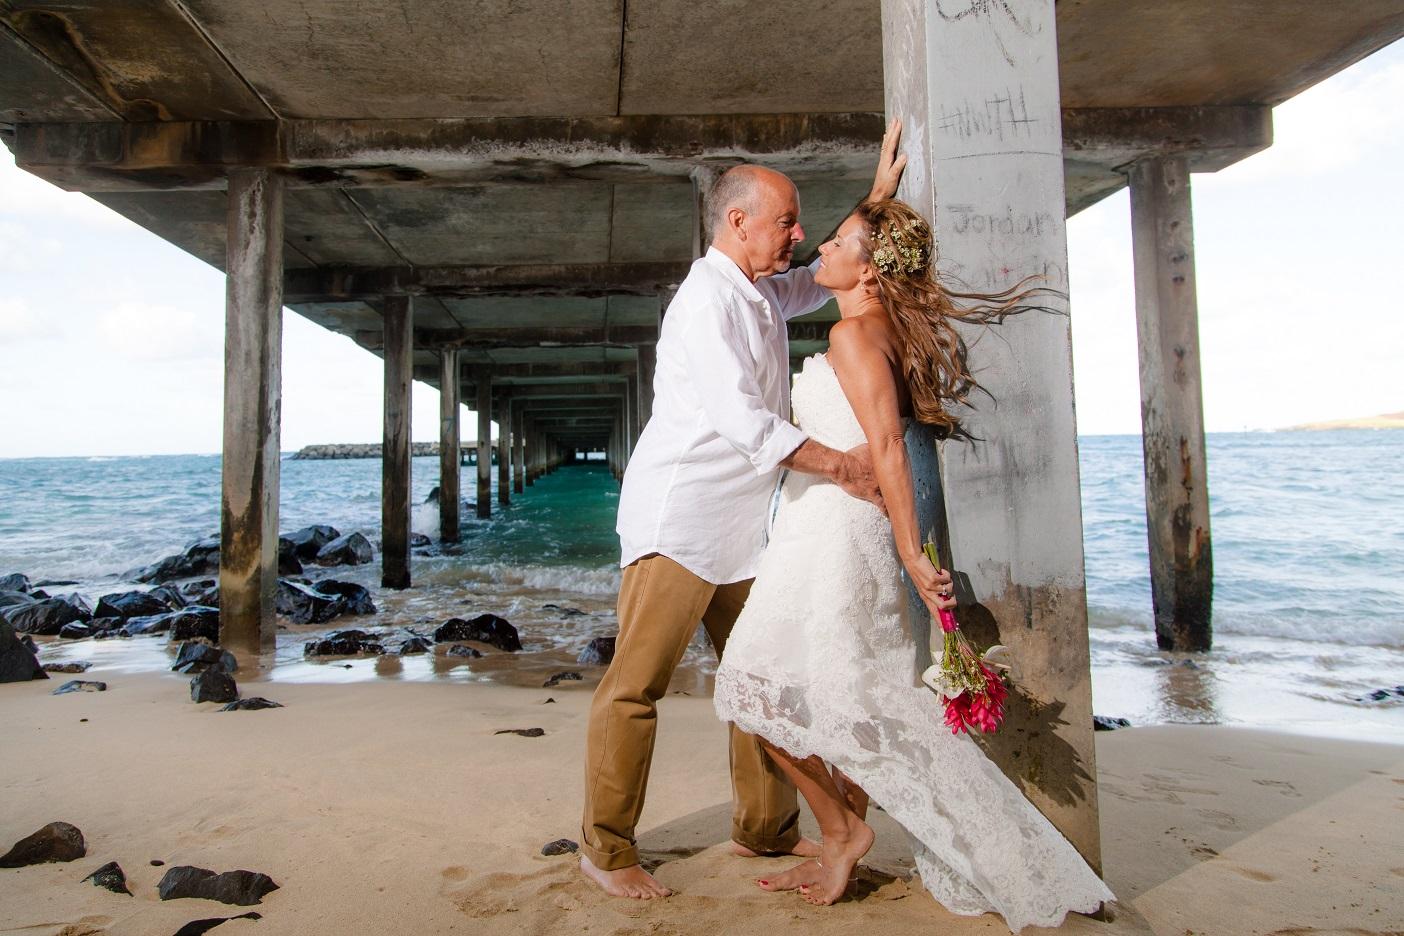 wedding photography makai pier oahu hawaii